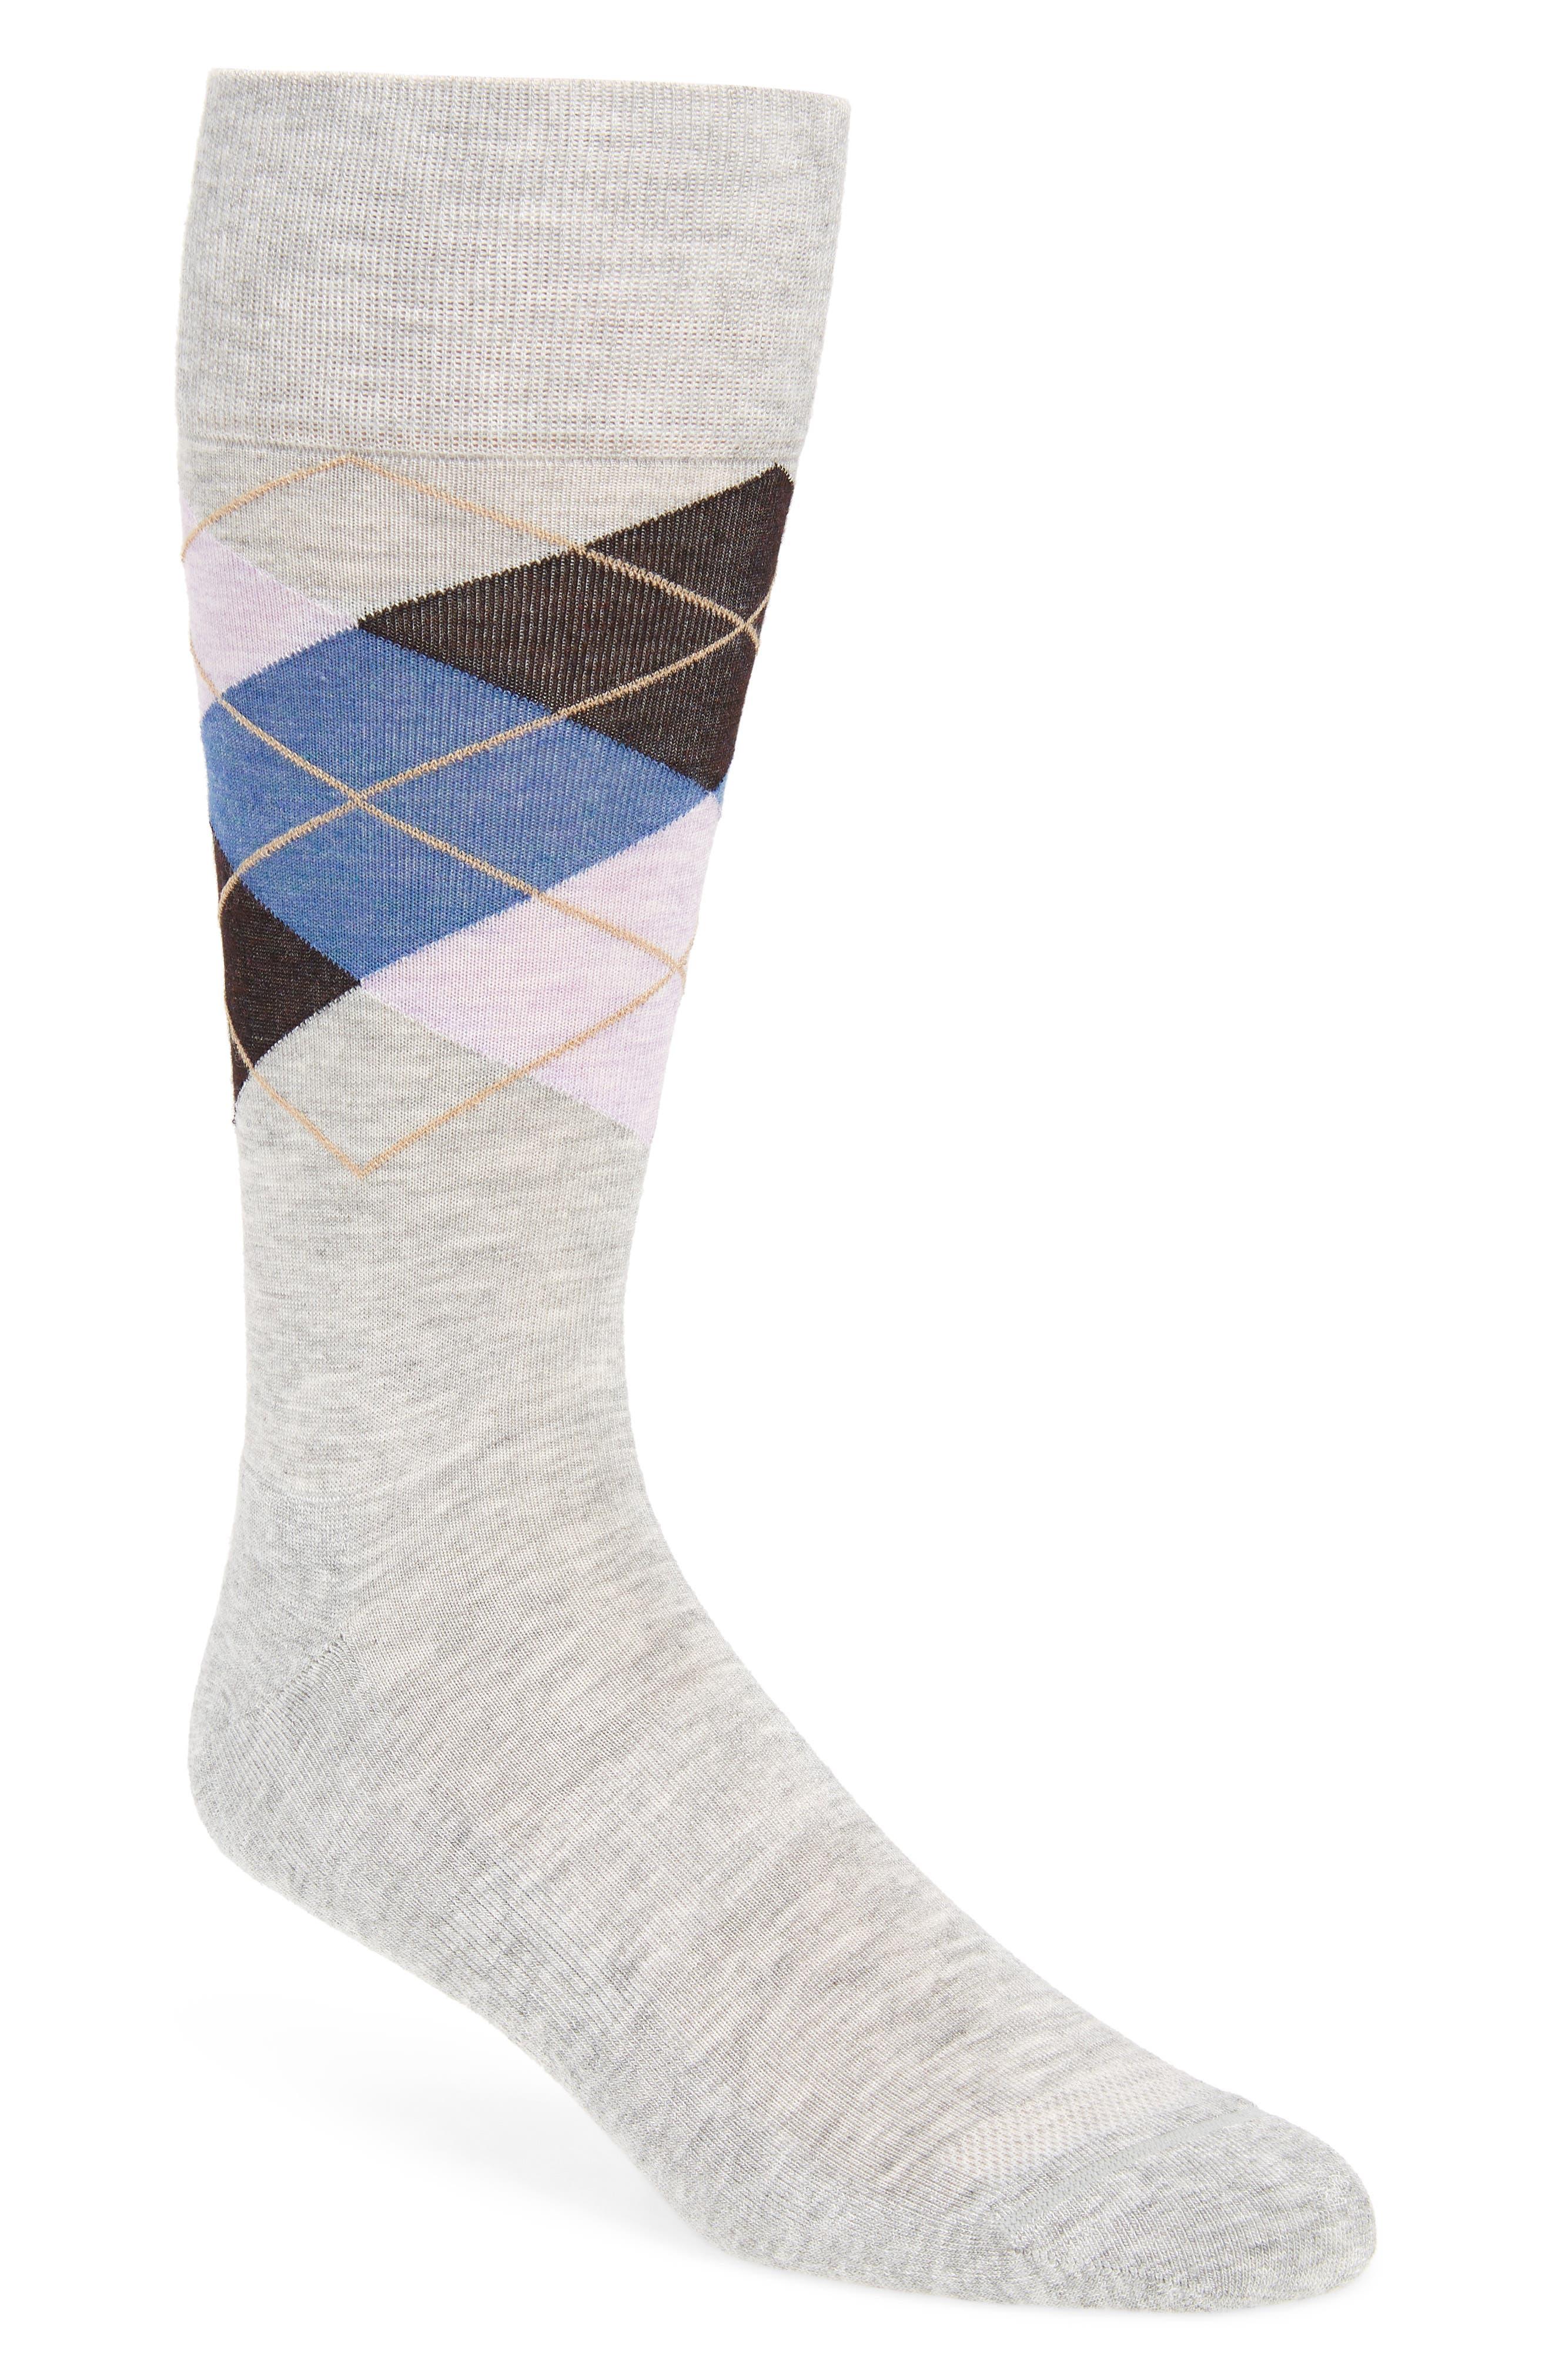 Argyle Socks,                             Main thumbnail 1, color,                             030